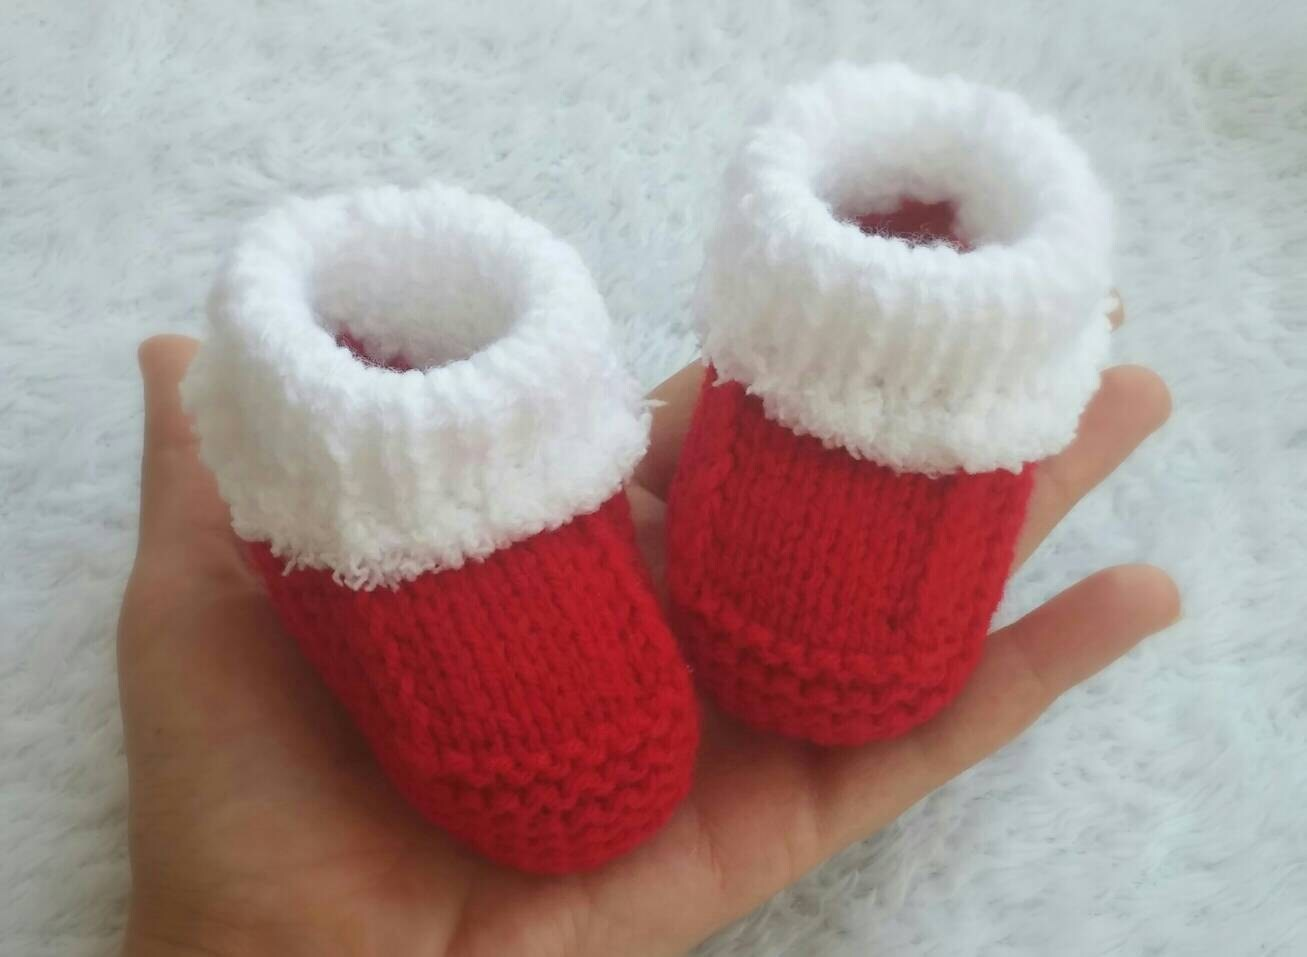 sports shoes ea841 9d29d Knitting Santa baby booties, Babbucce neonato Natale ai ferri, Calzini  neonato, Newborn socks, baby socks, baby christmas socks